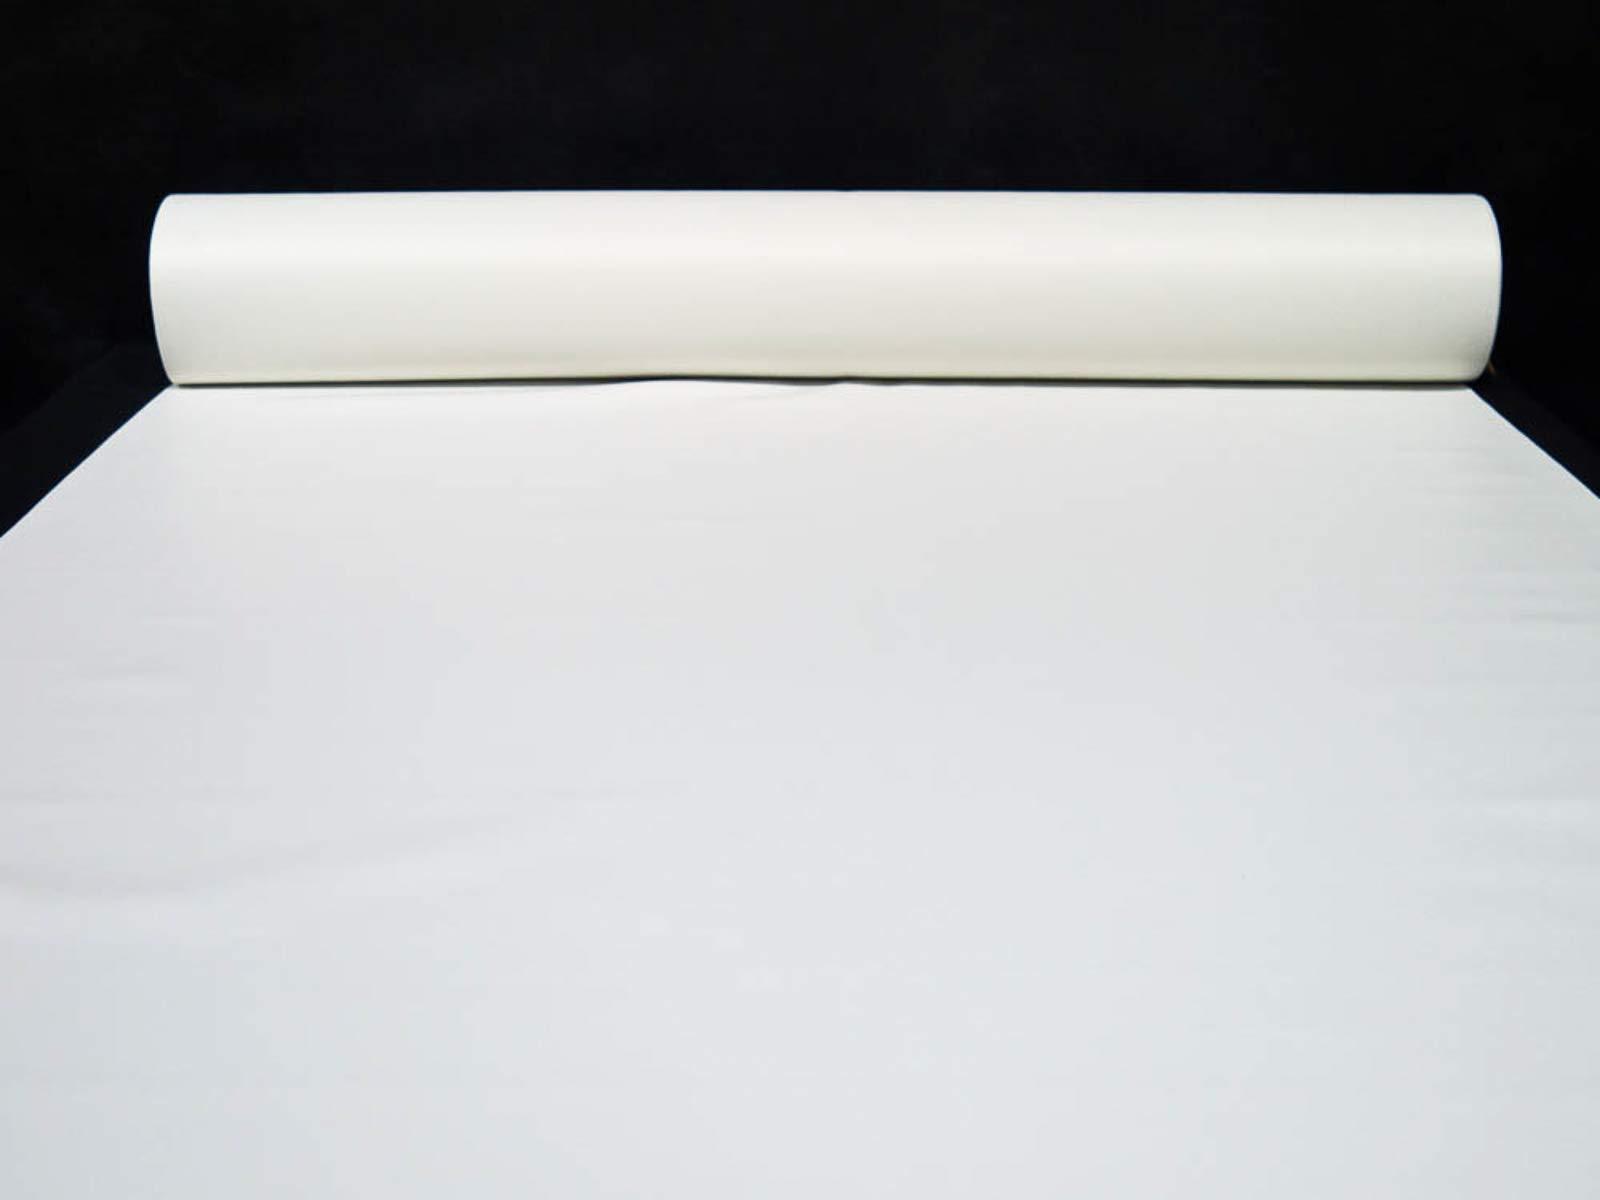 Bry-Tech Marine1 Marine Vinyl Upholstery Fabric Bright White 54'' Wide by 10 Yards Boat Auto by Bry-Tech Marine1 (Image #3)